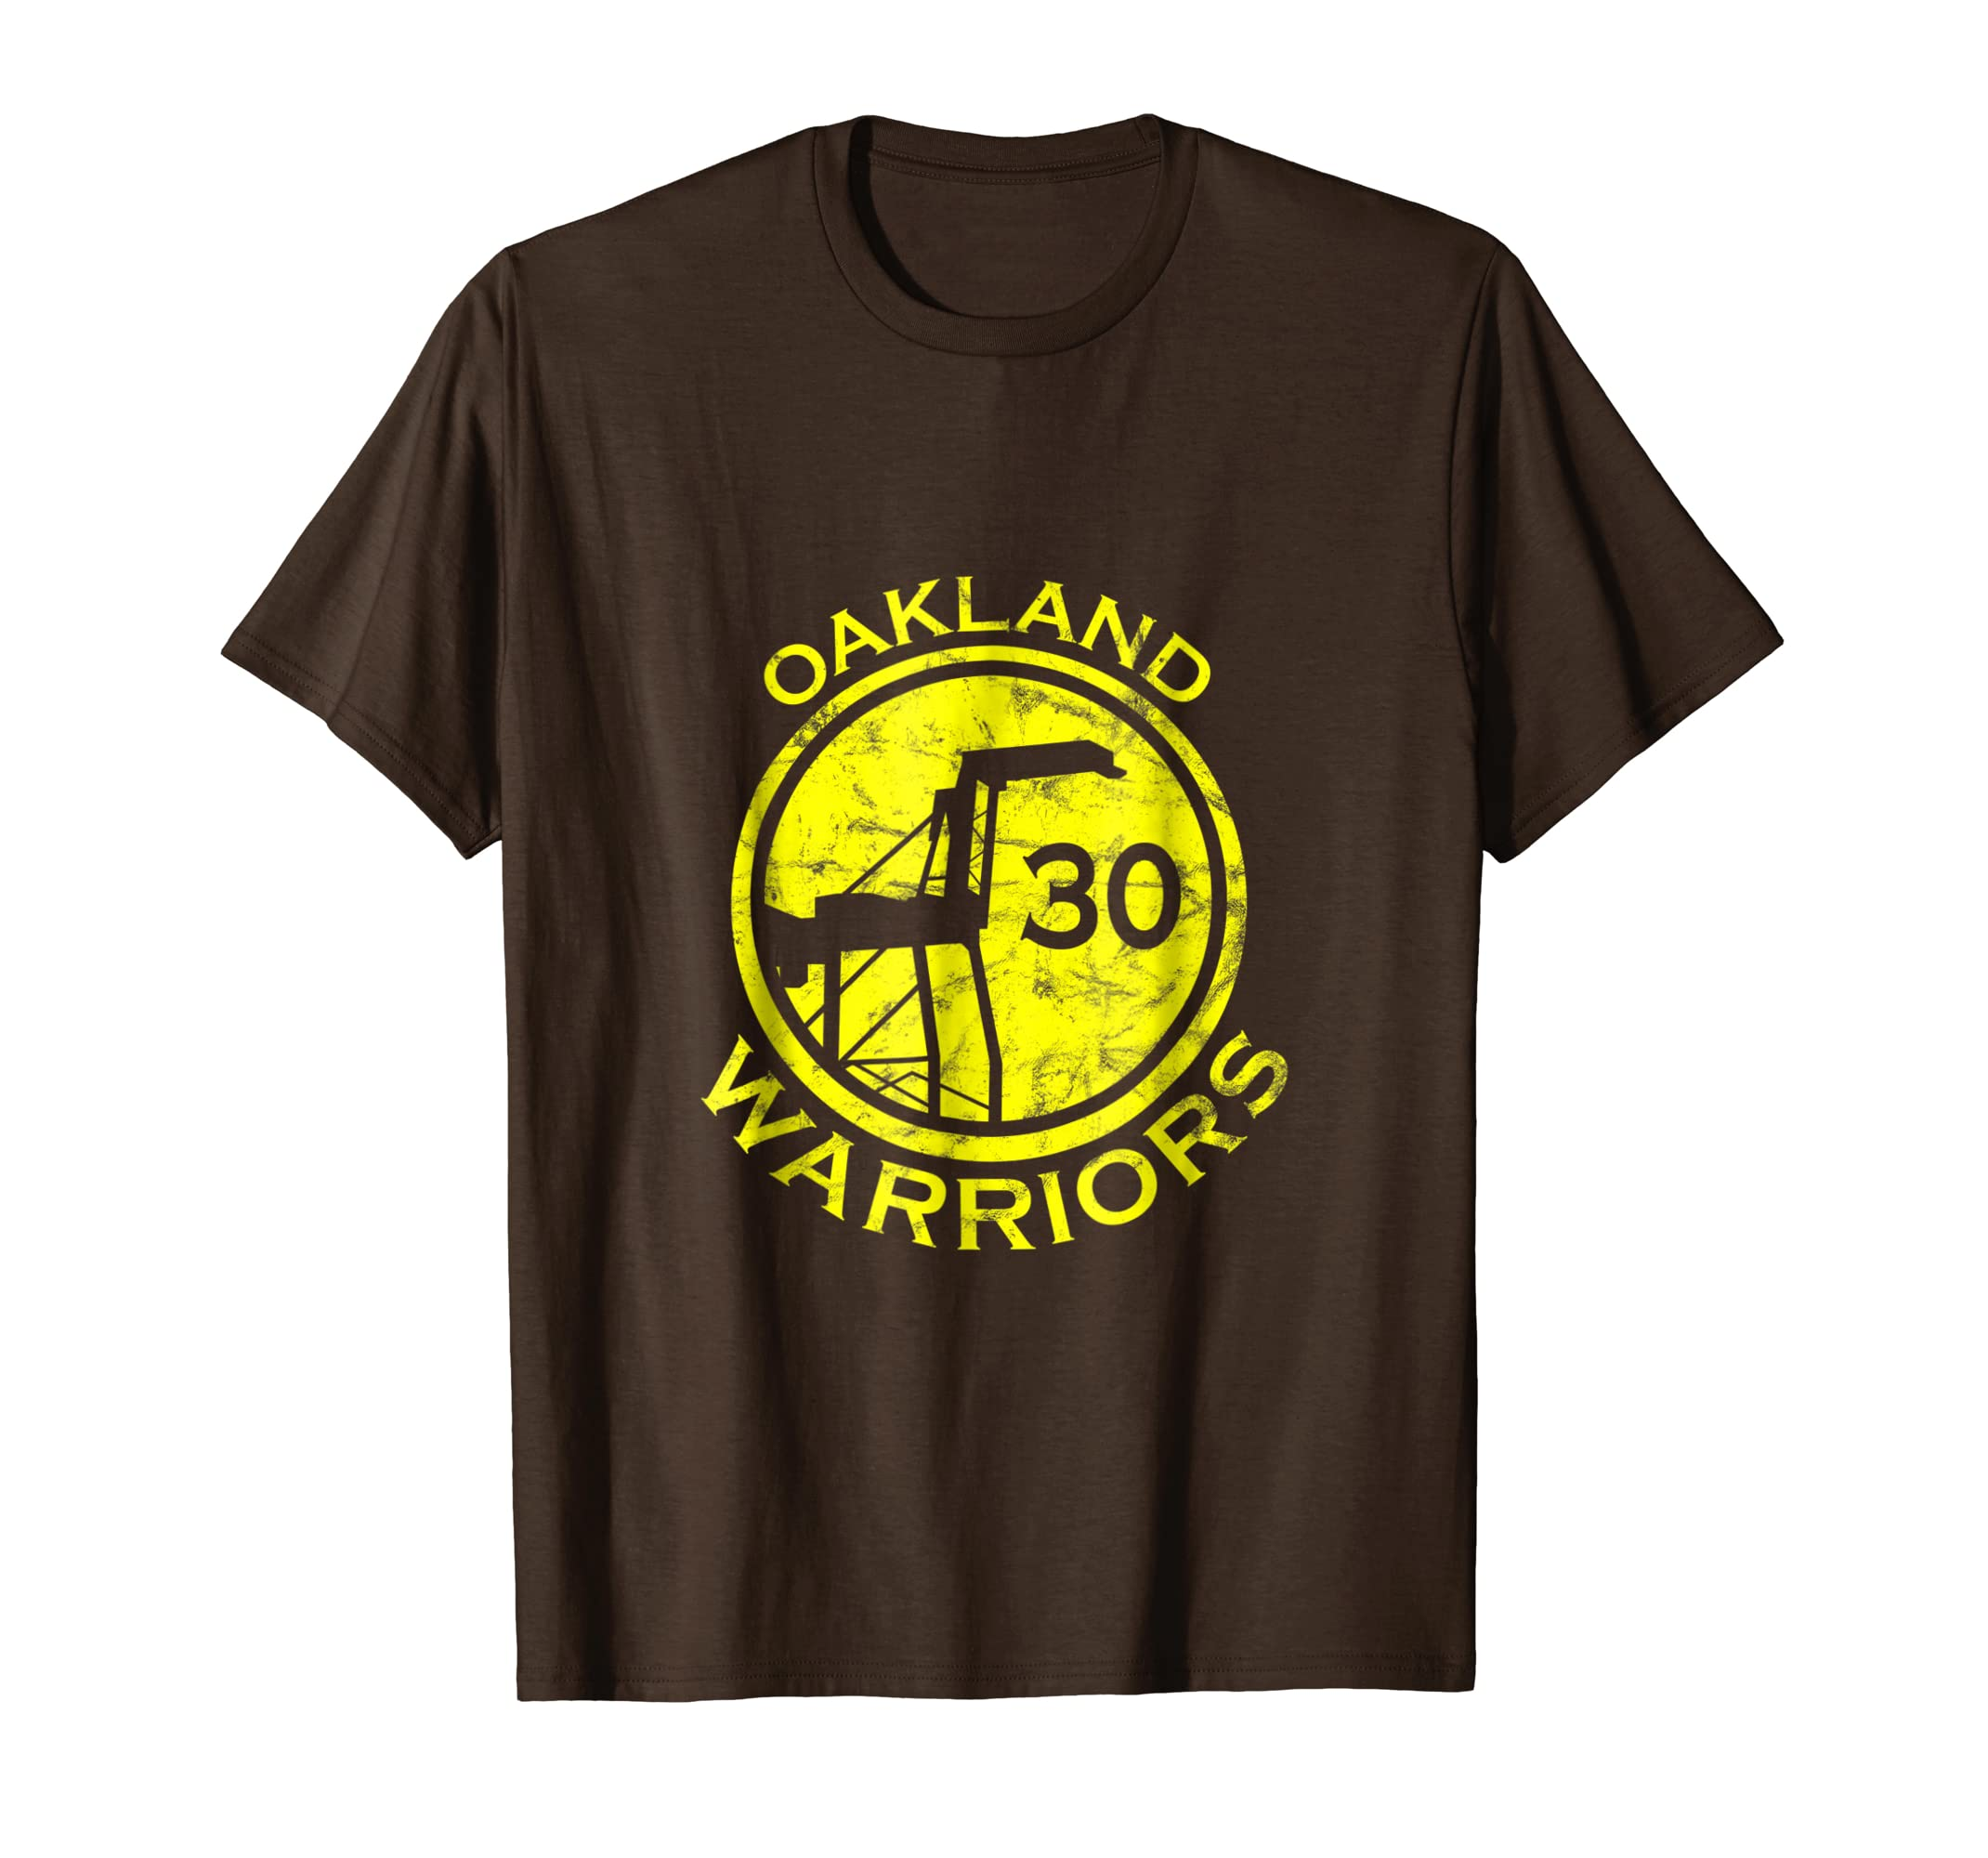 Amazon com: Oakland Warriors Town T-Shirt: Clothing